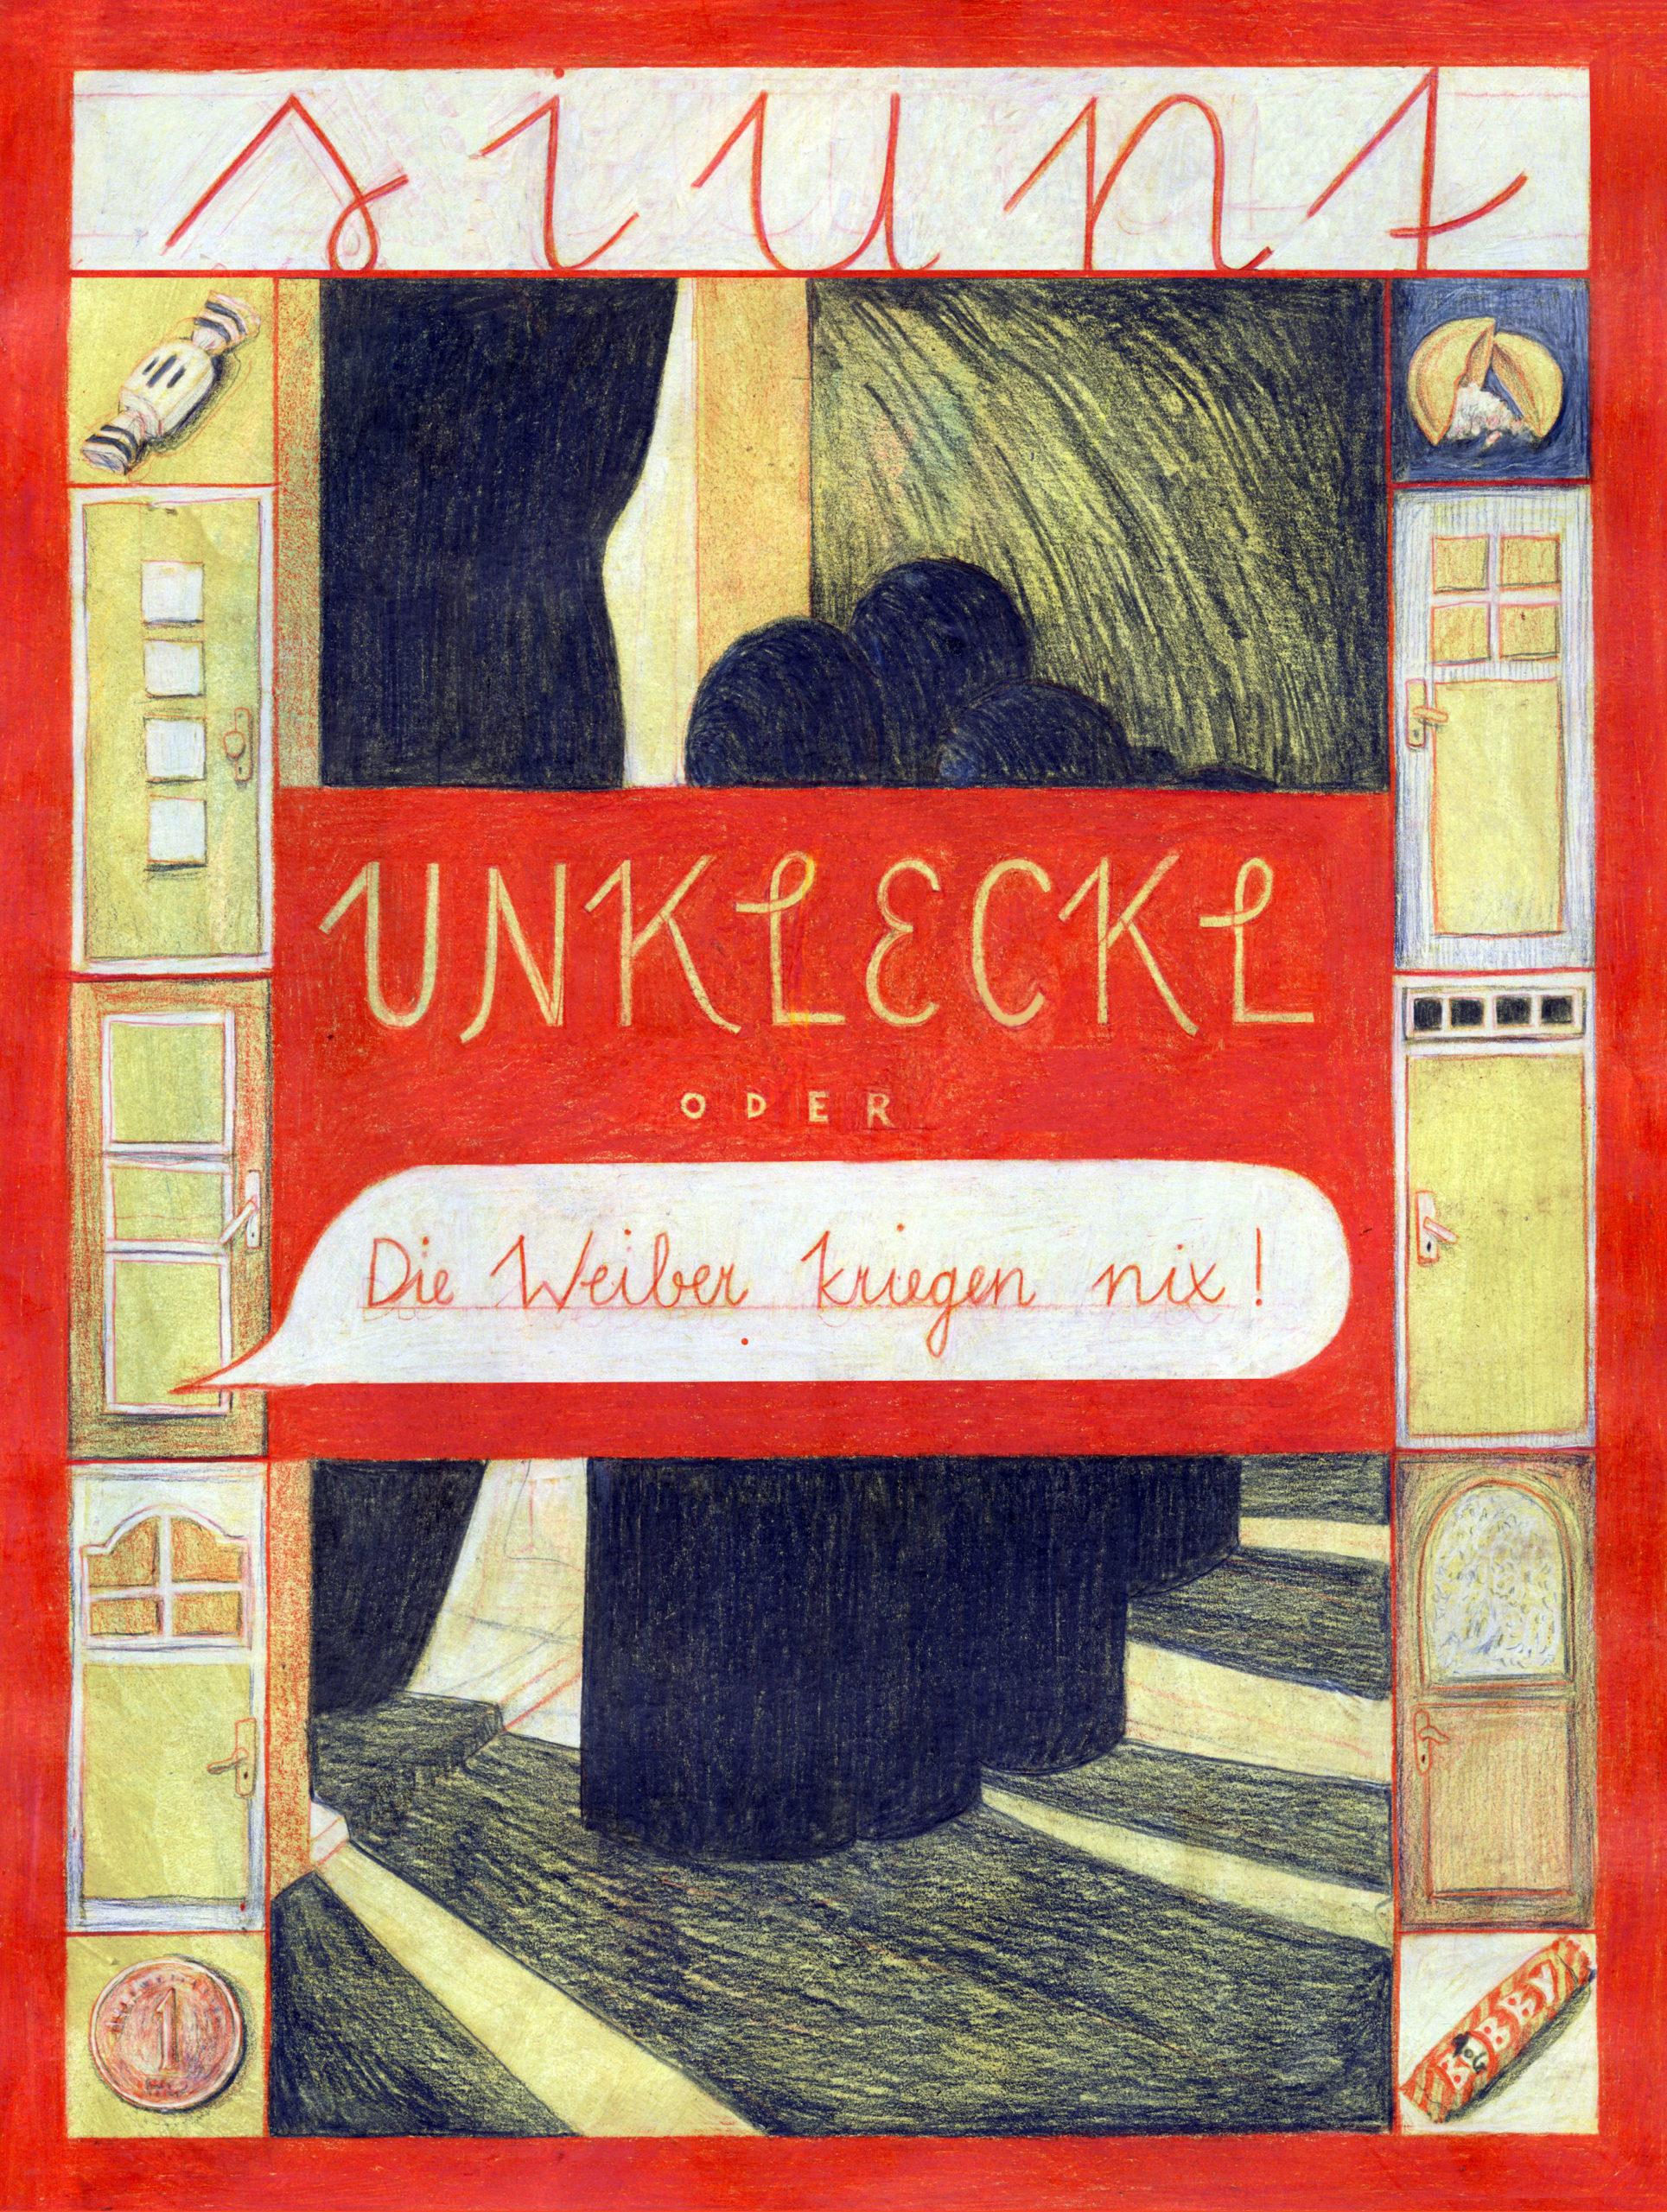 unkleckl